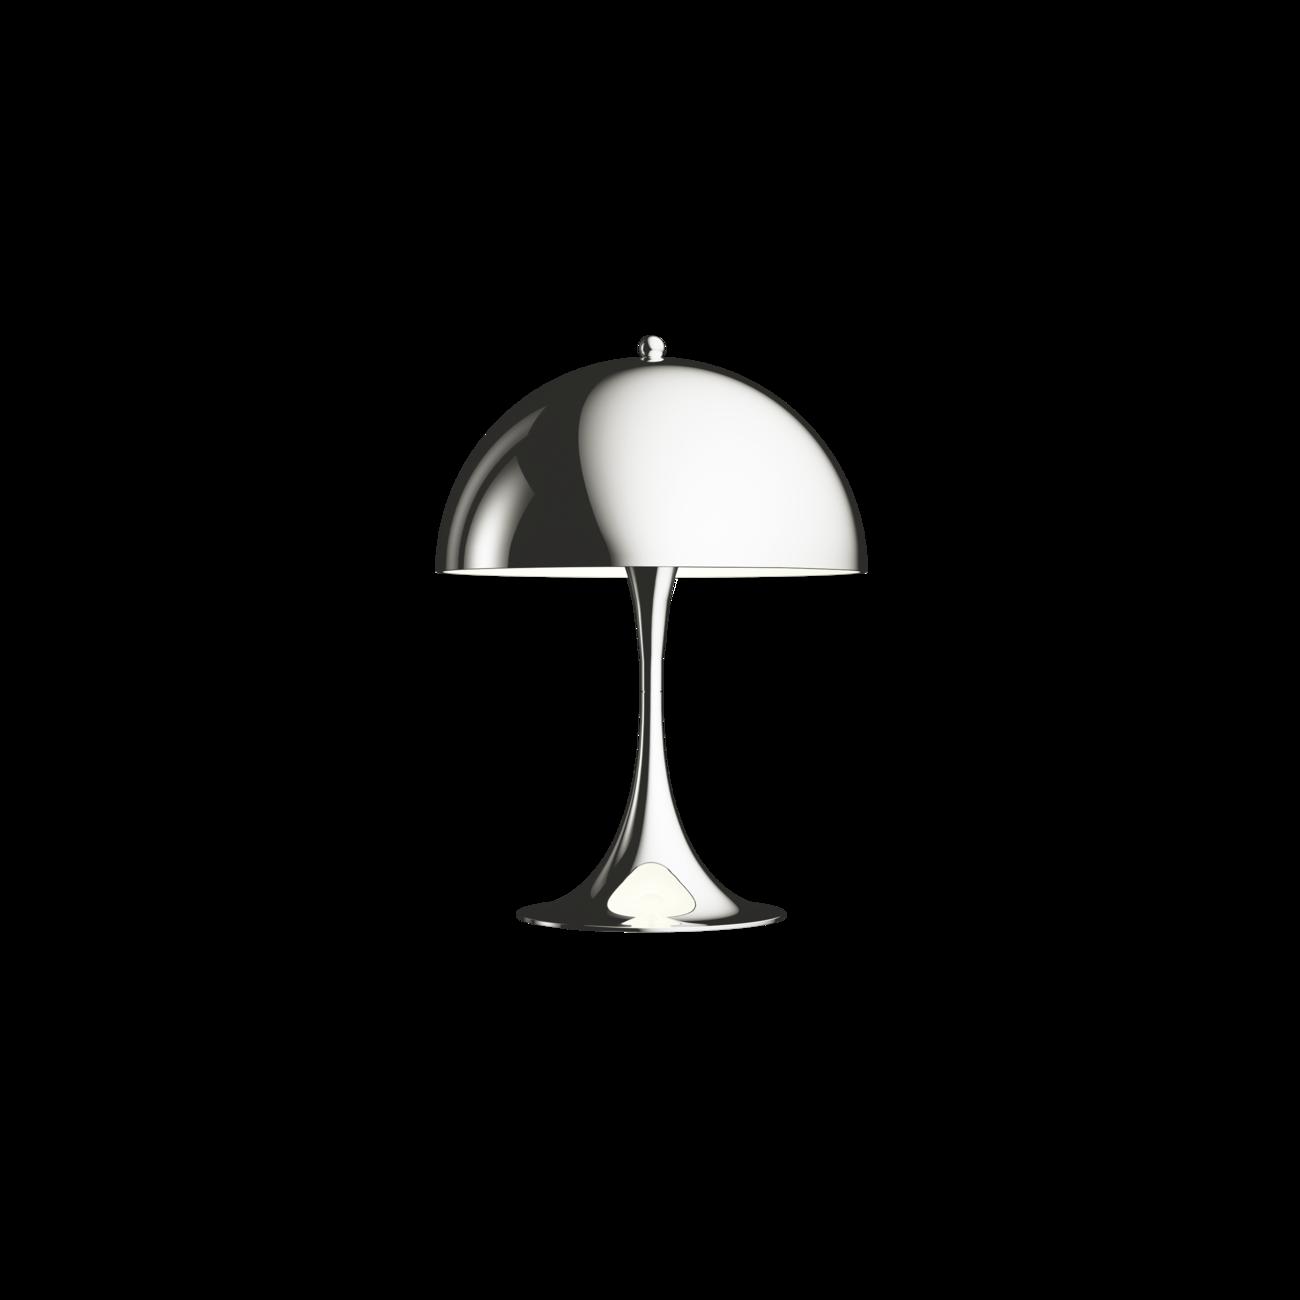 Louis Poulsen Panthella Mini tafellamp Hooggl verchroomd